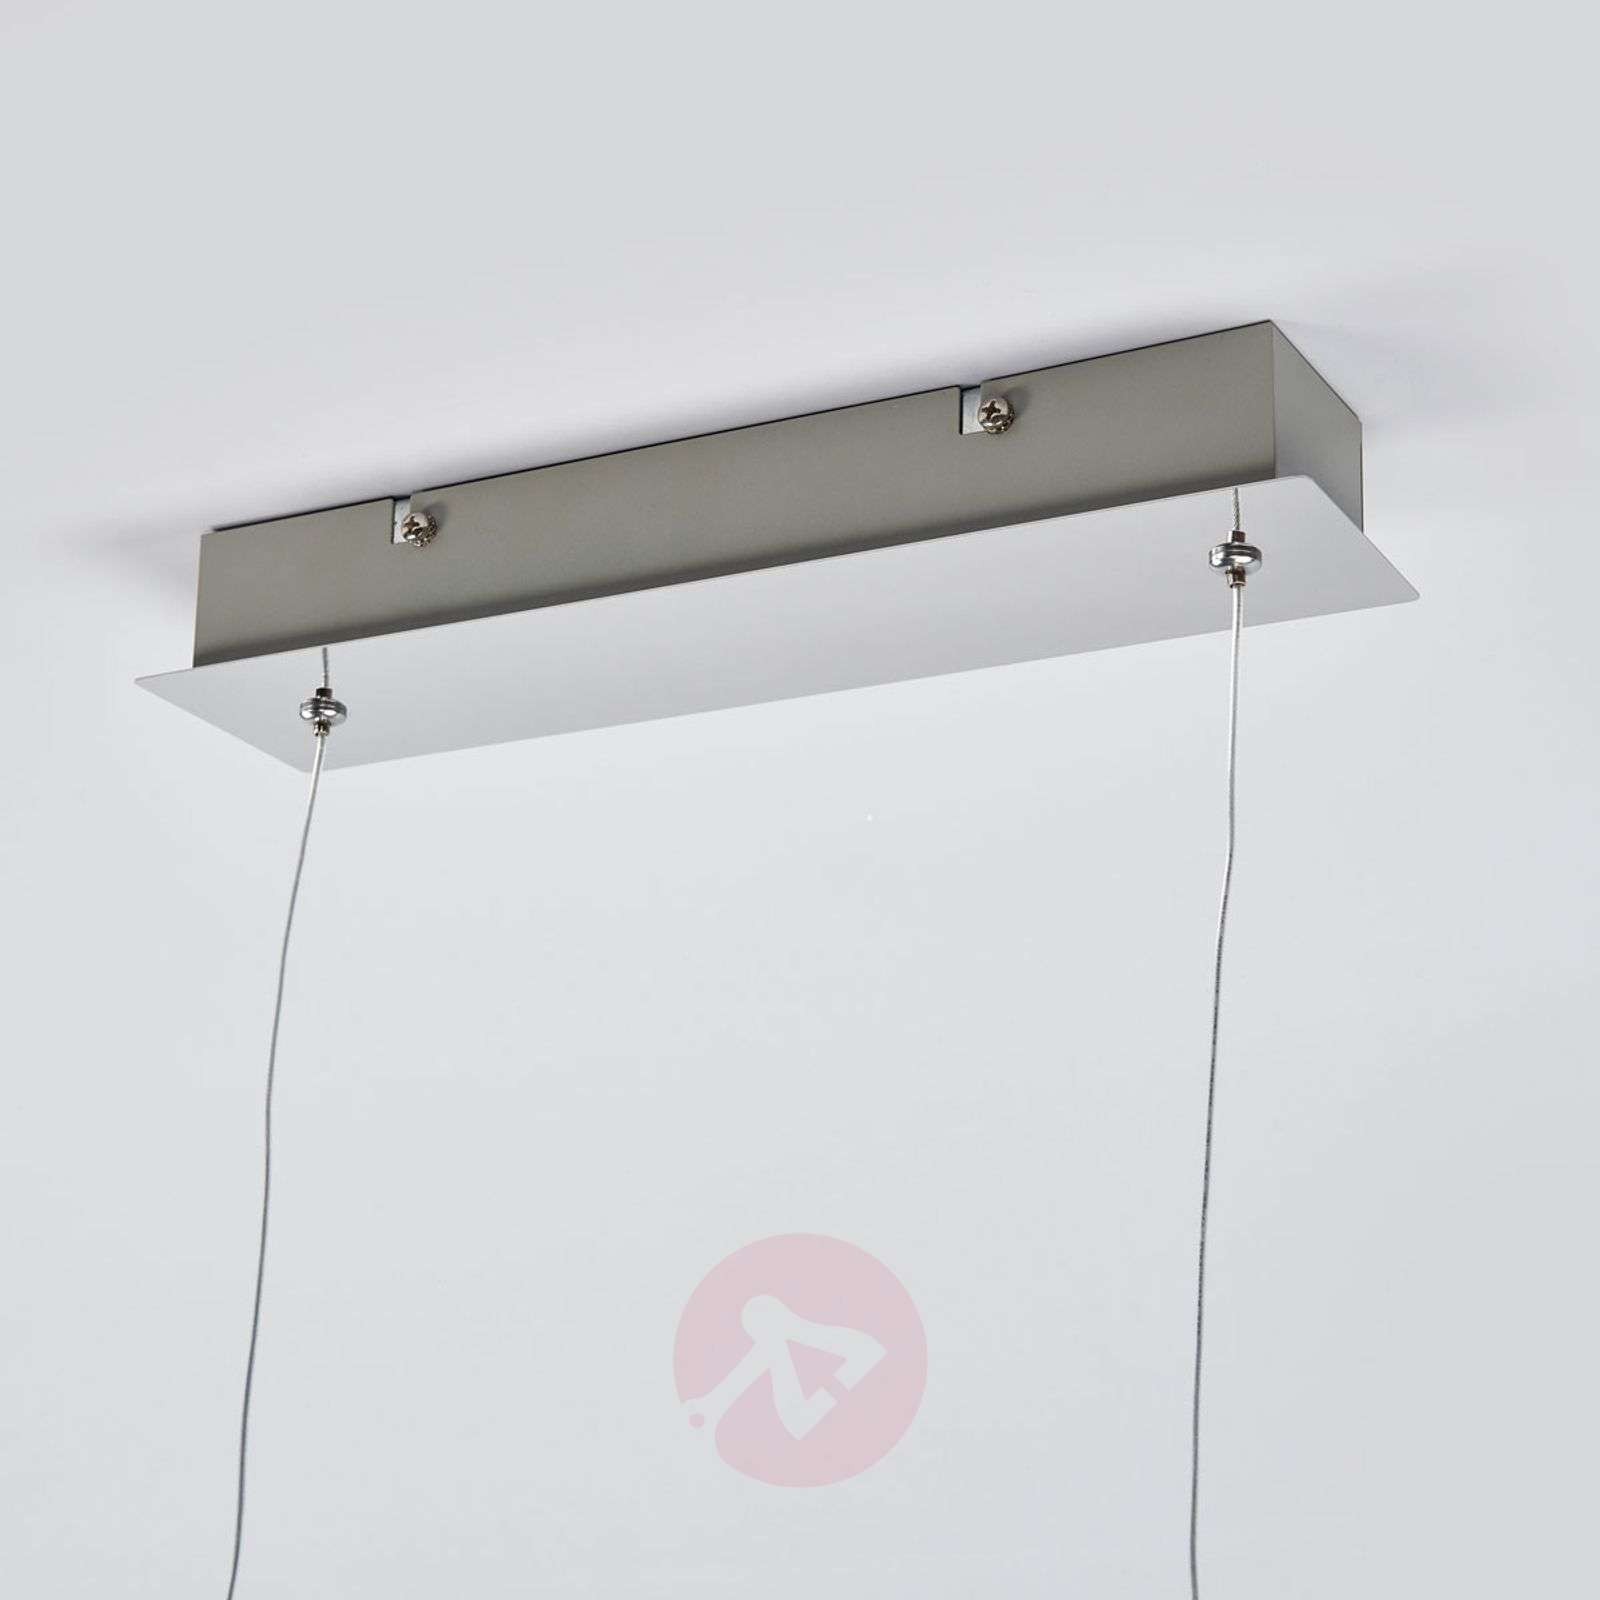 Puristic LED pendant light Florentina-9994102-02